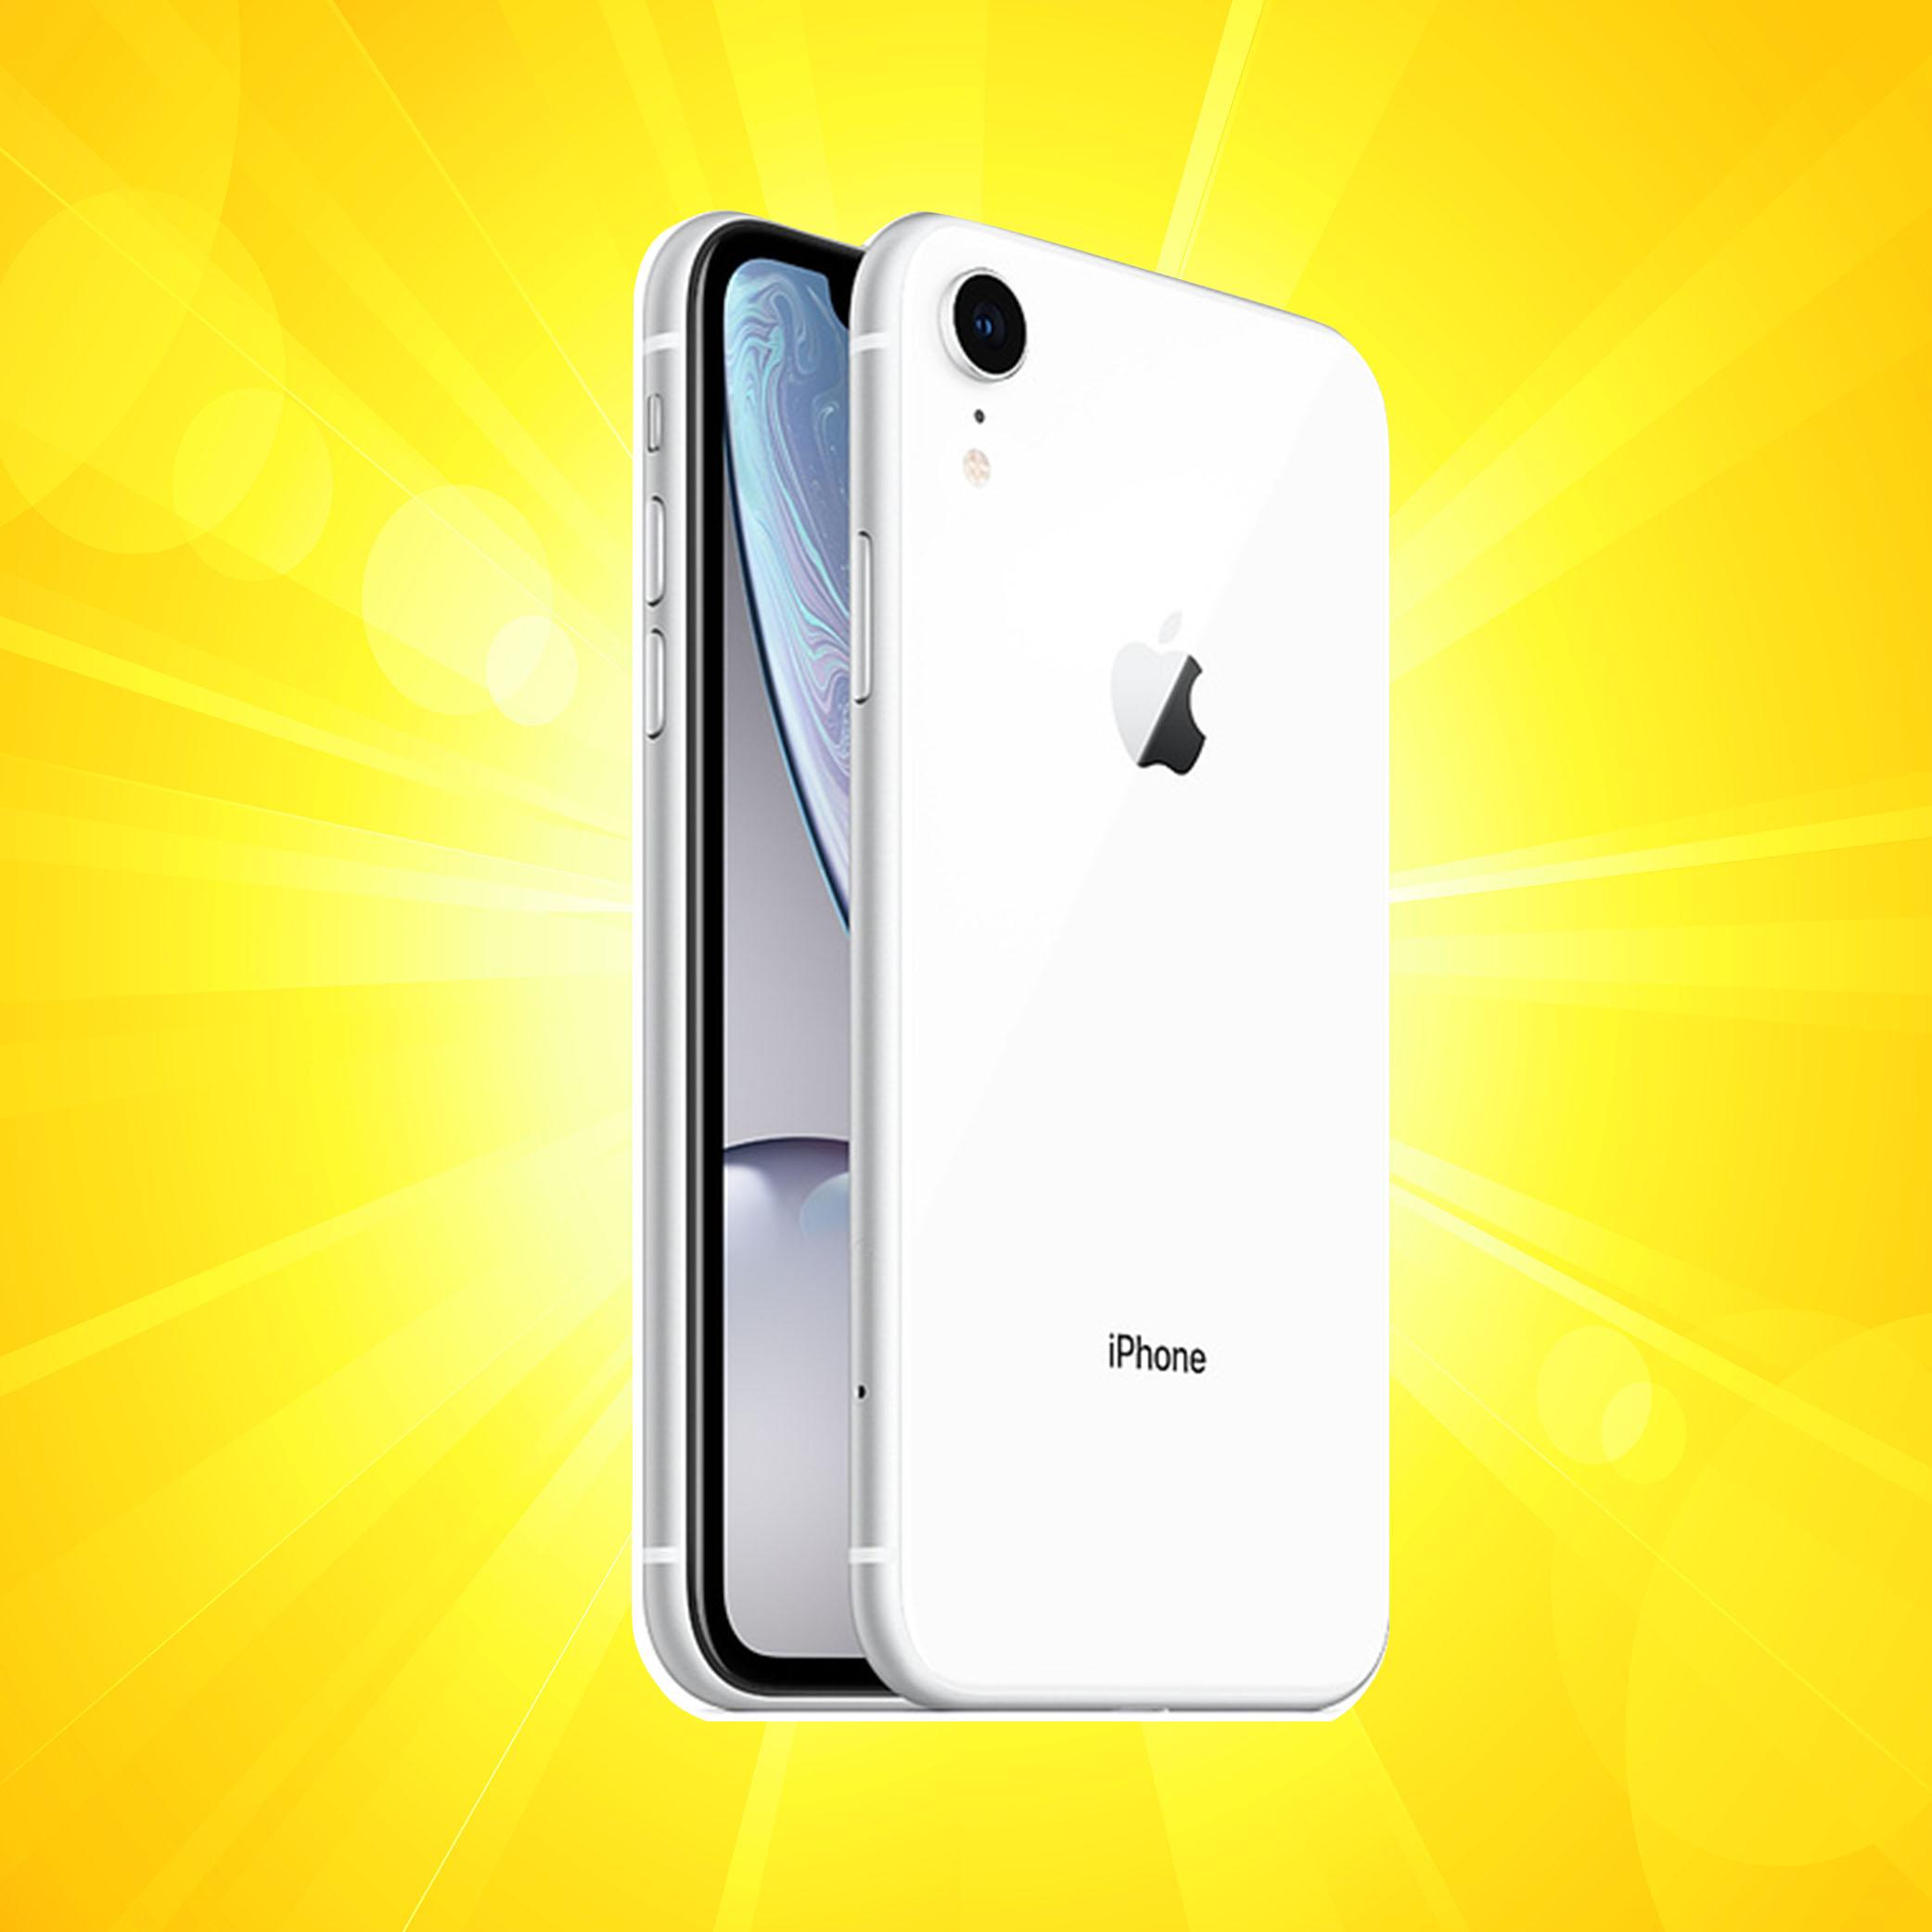 apple iphone xr 64gb weiss ohne simlock neu ovp. Black Bedroom Furniture Sets. Home Design Ideas